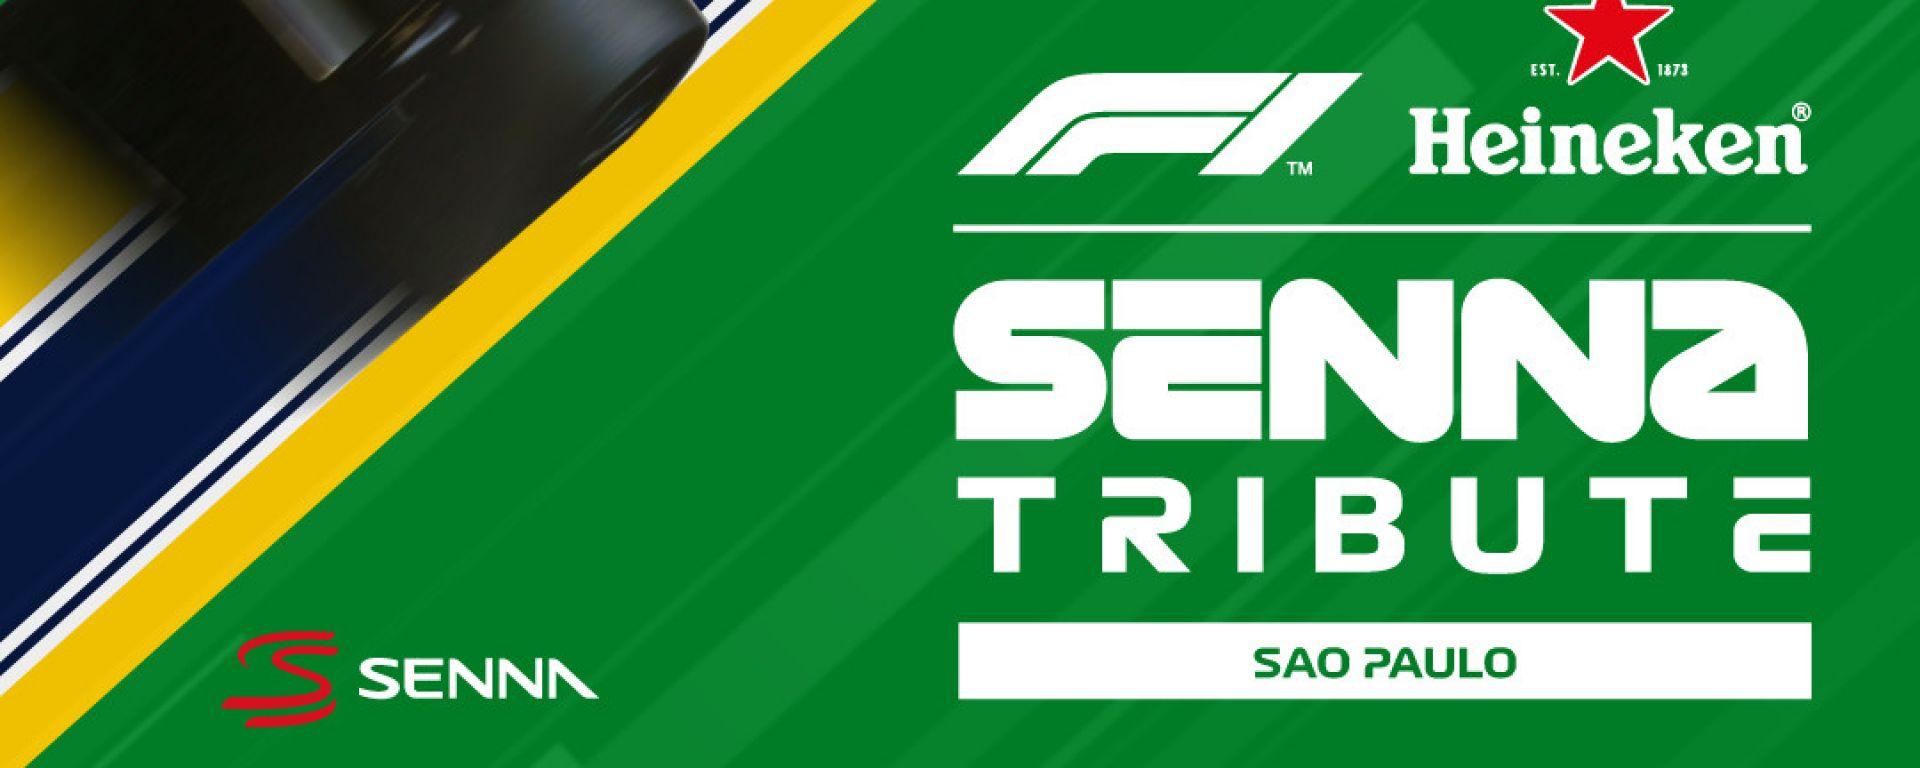 F1, Senna Tribute 2019